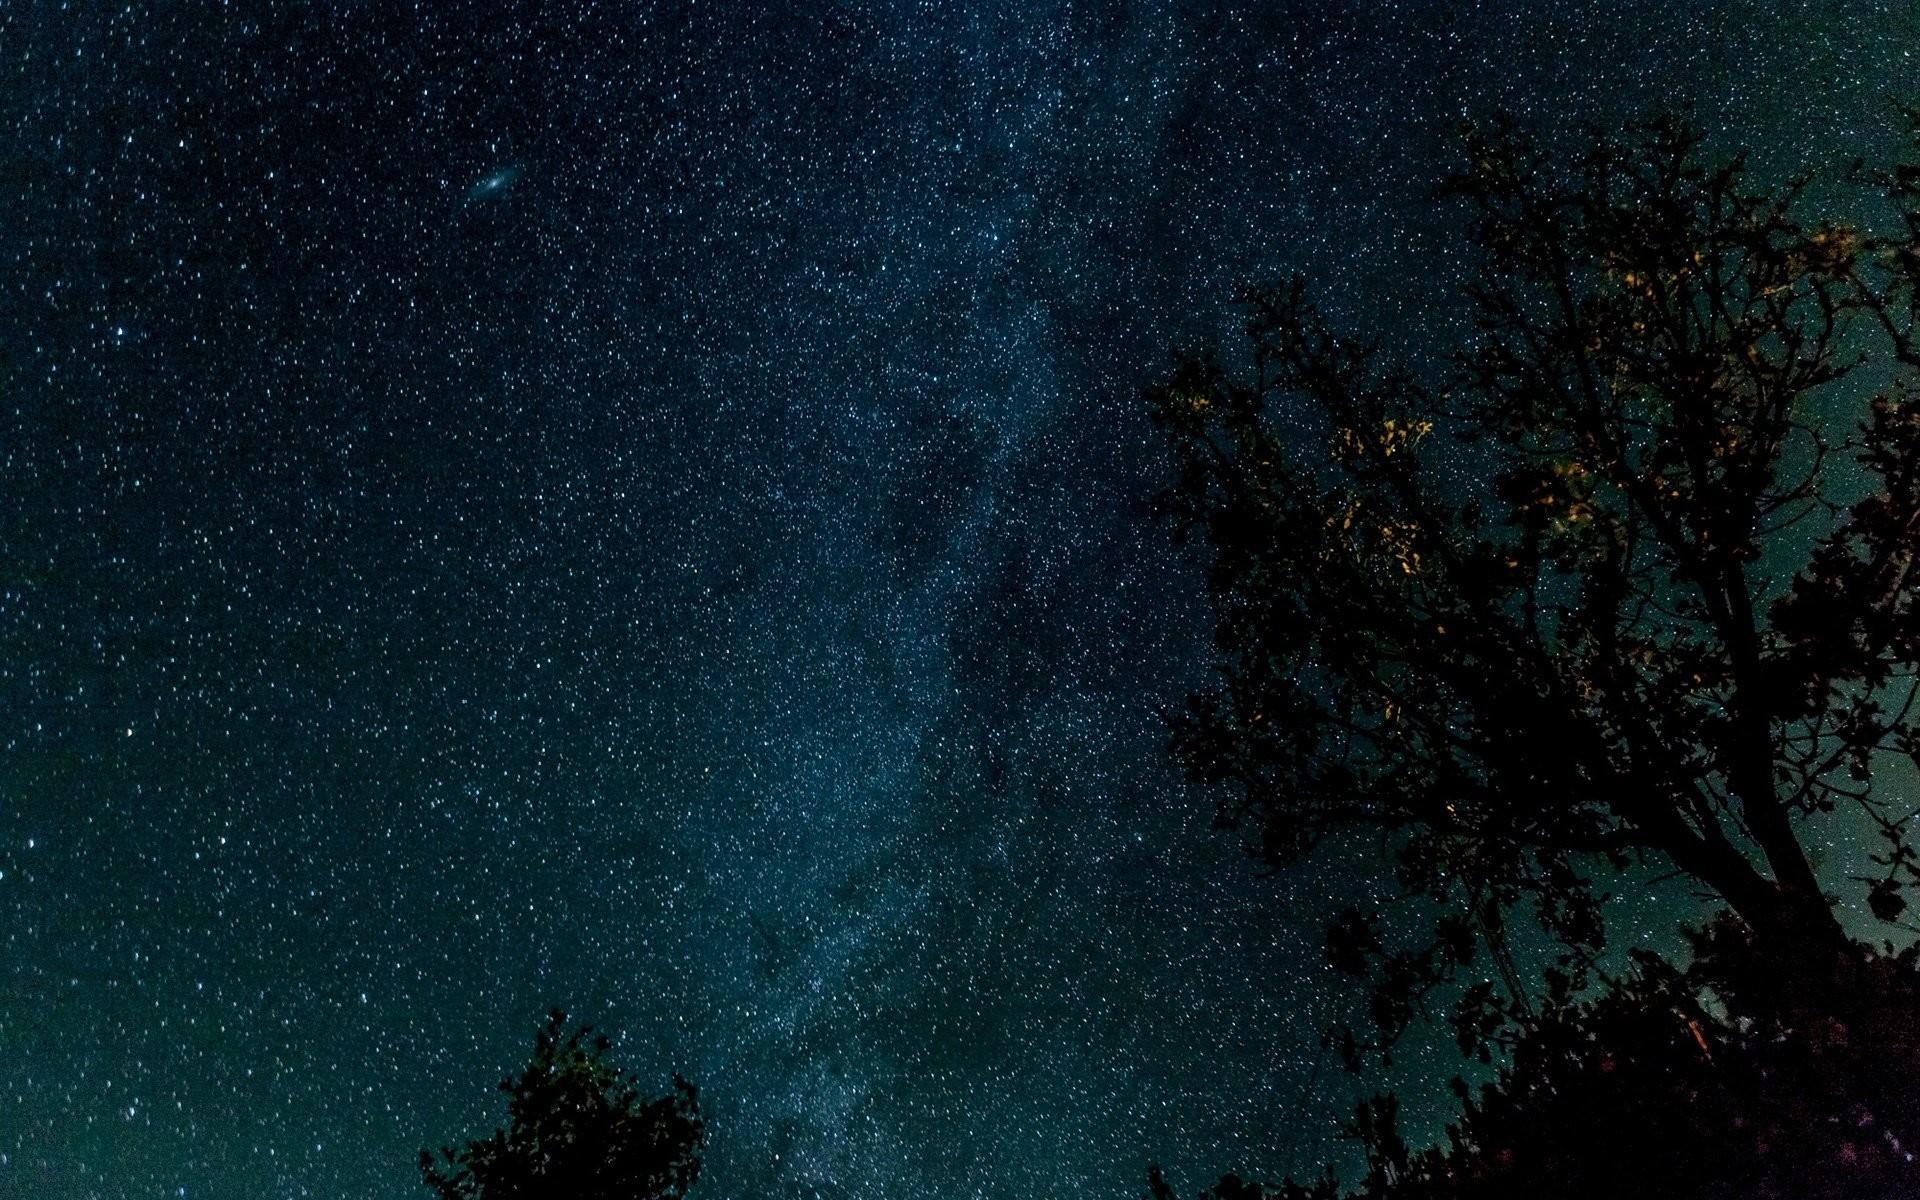 https://www.walldevil.com/wallpapers/w09/space-trees-stars-starry-night.jpg  | the Trees are full of Starlight | Pinterest